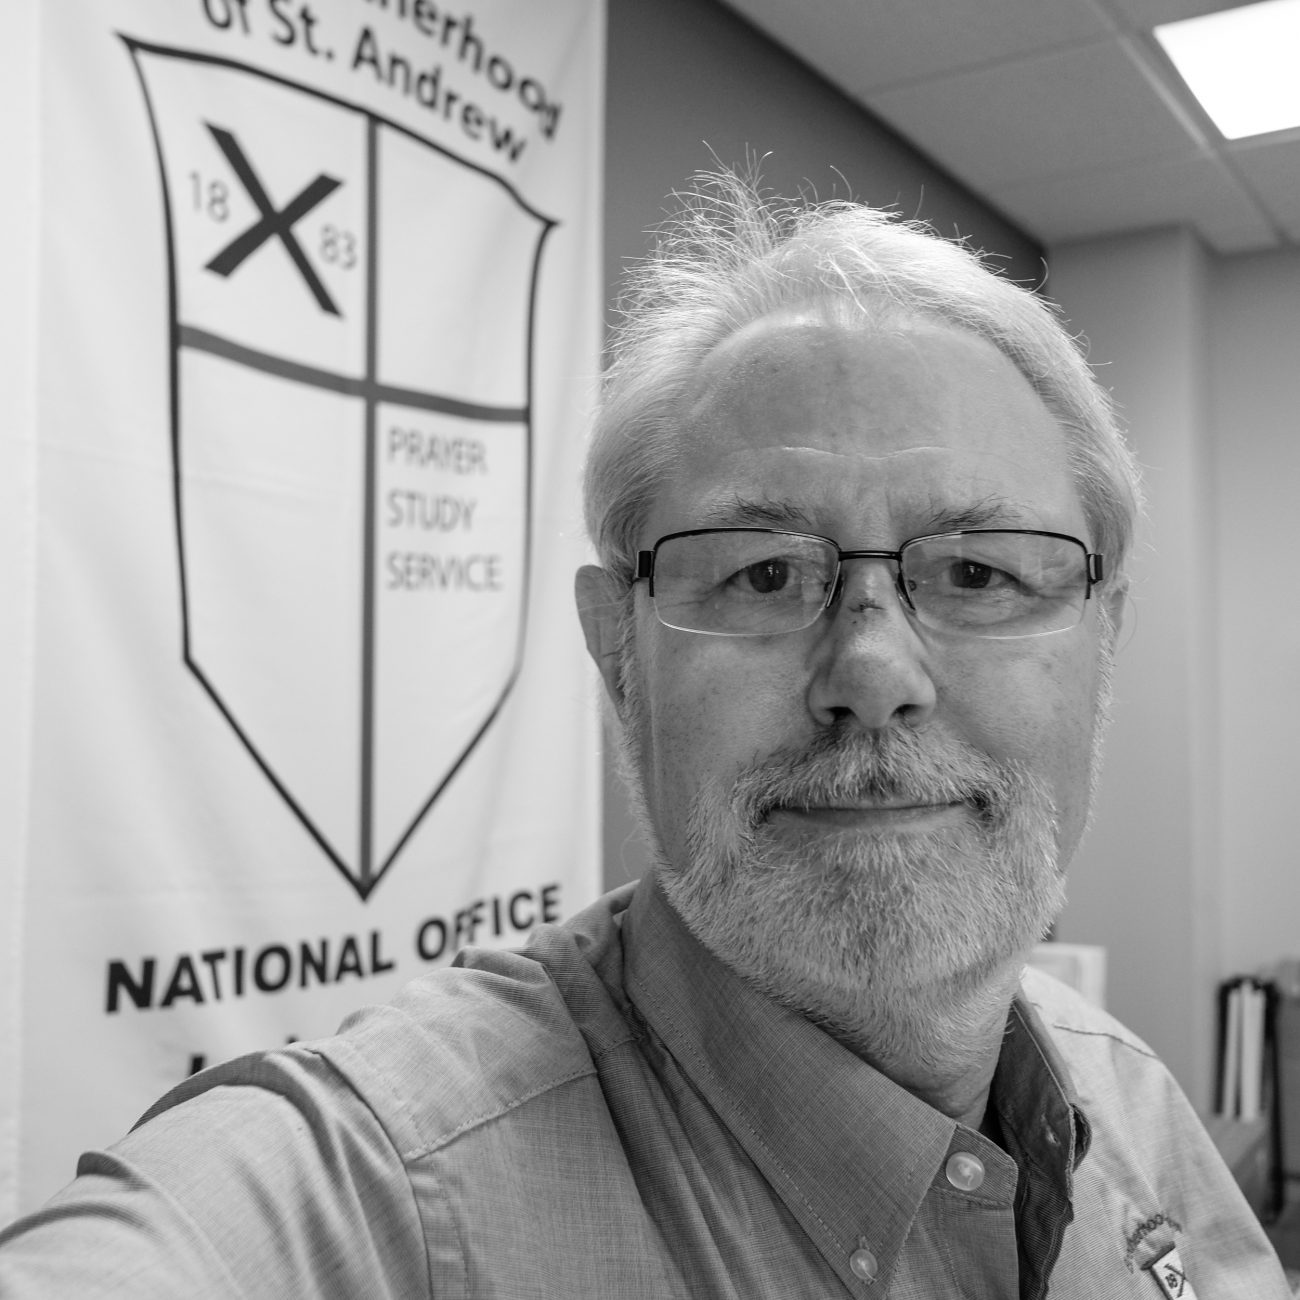 Black and white image of Gary Allman - Springfield, Missouri.